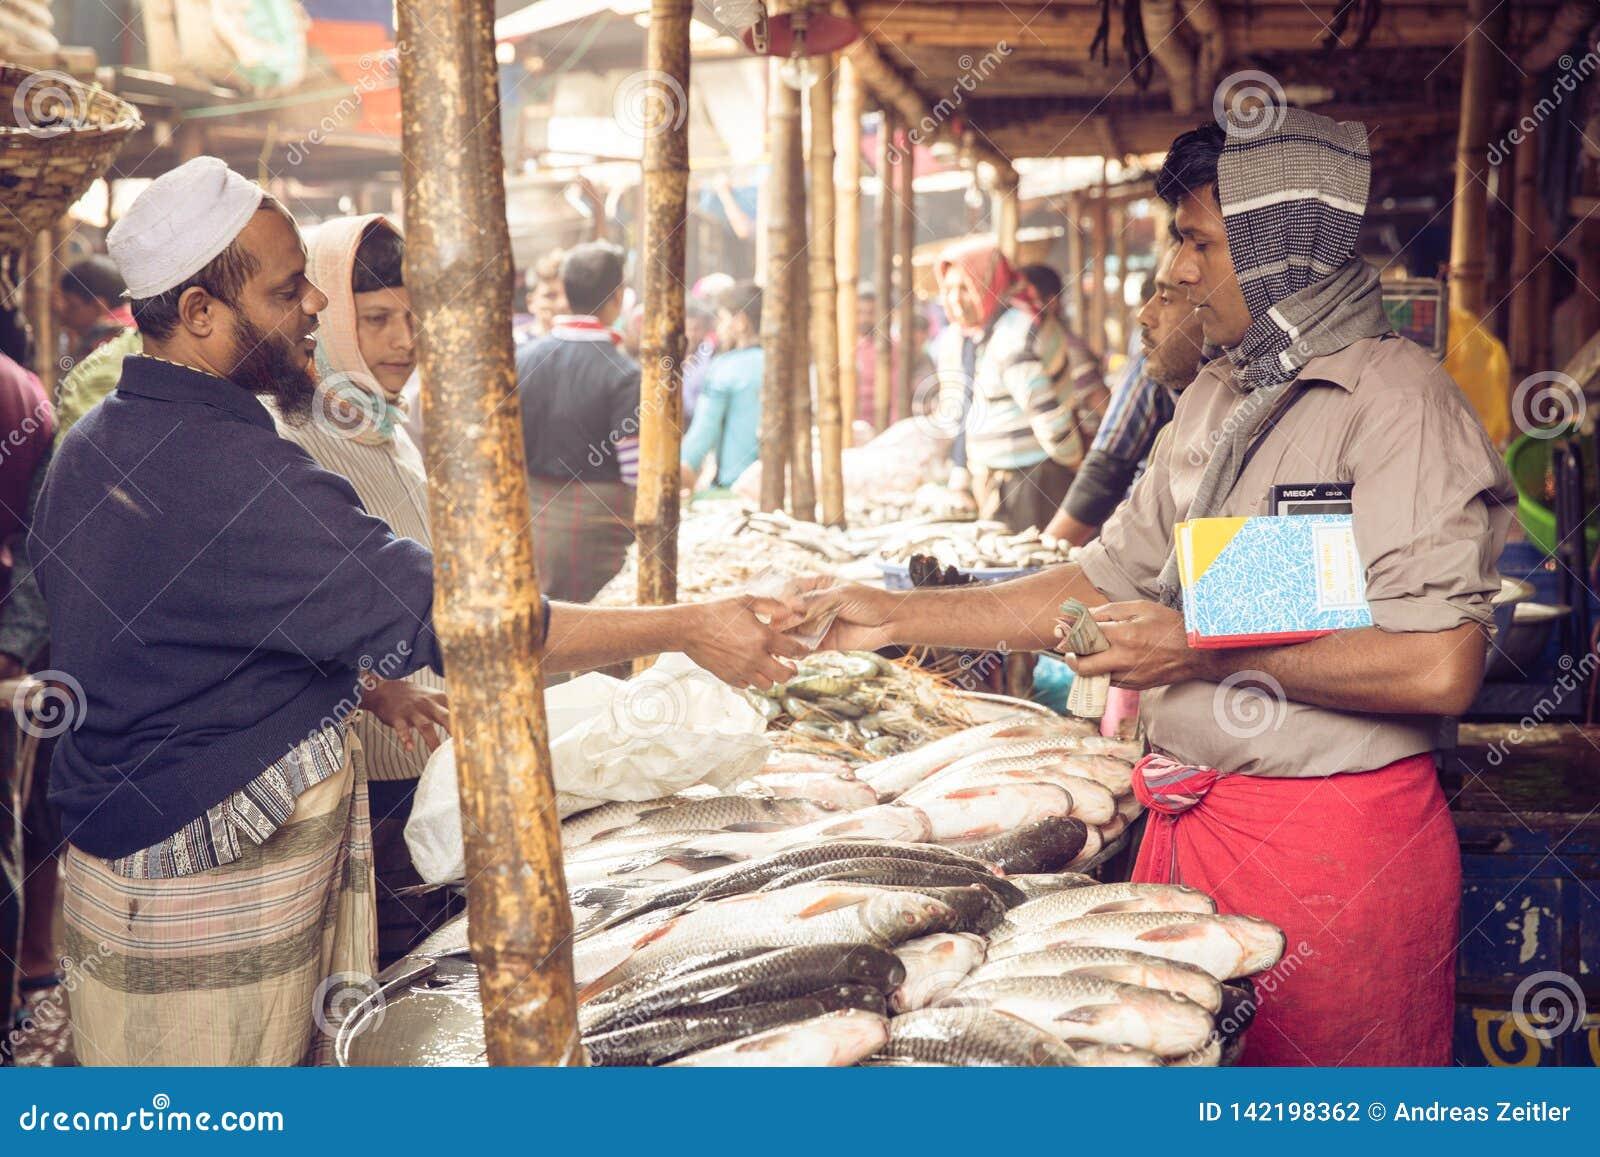 Fish market in the busy capital of Dhaka, Bangladesh